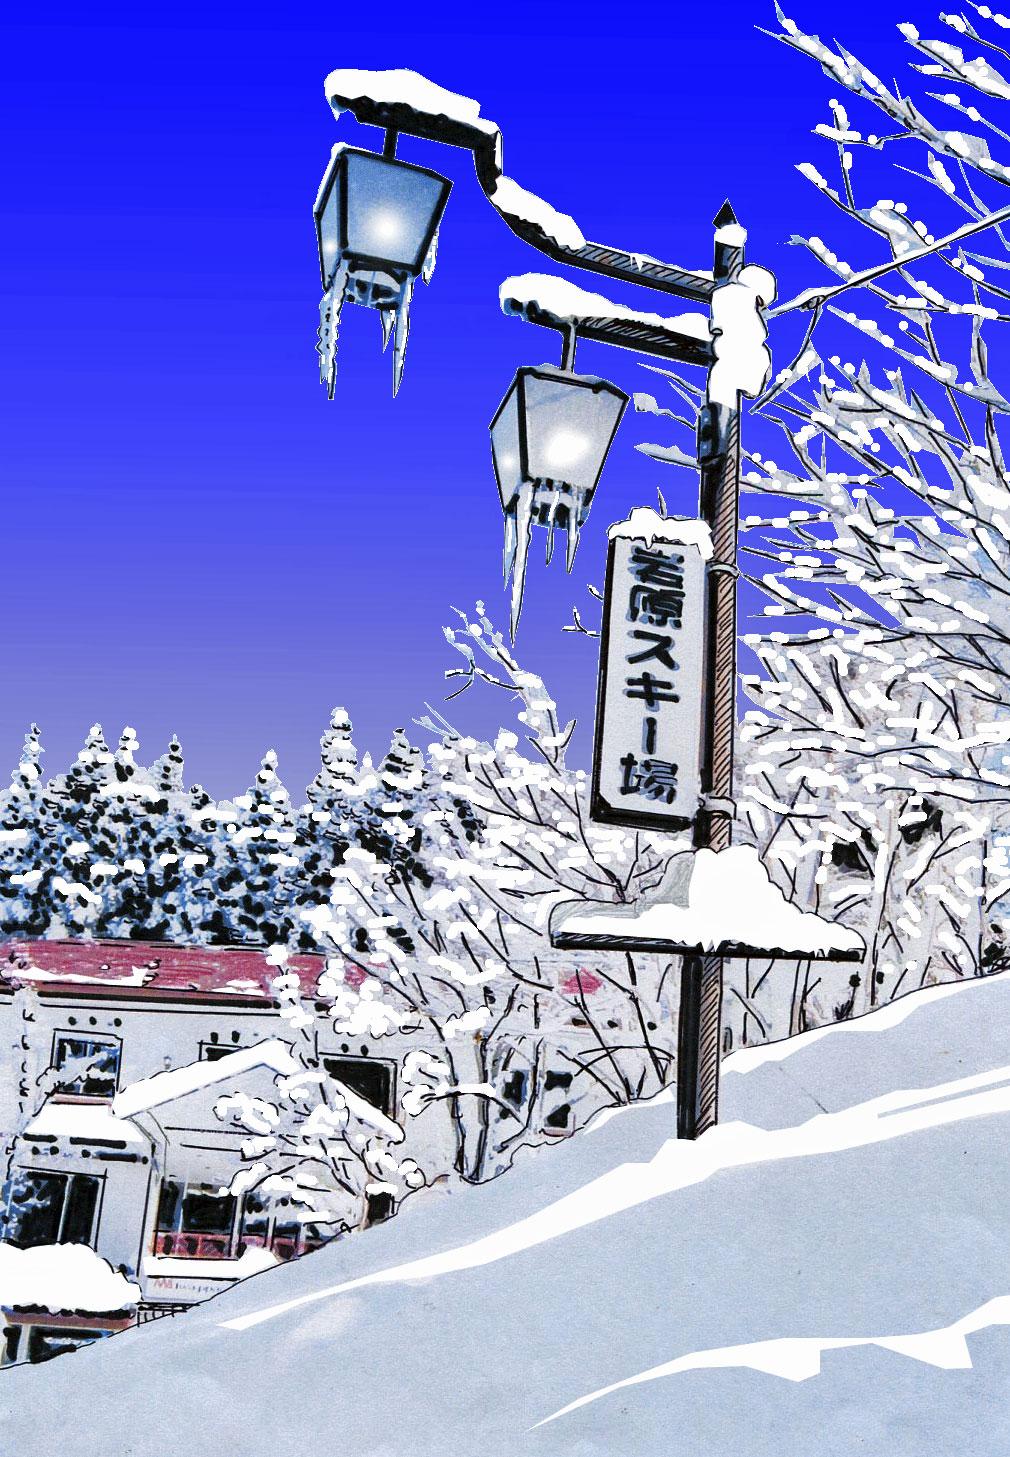 http://hakkaisan-photo.com/season/9%E5%B2%A9%E5%8E%9F.jpg